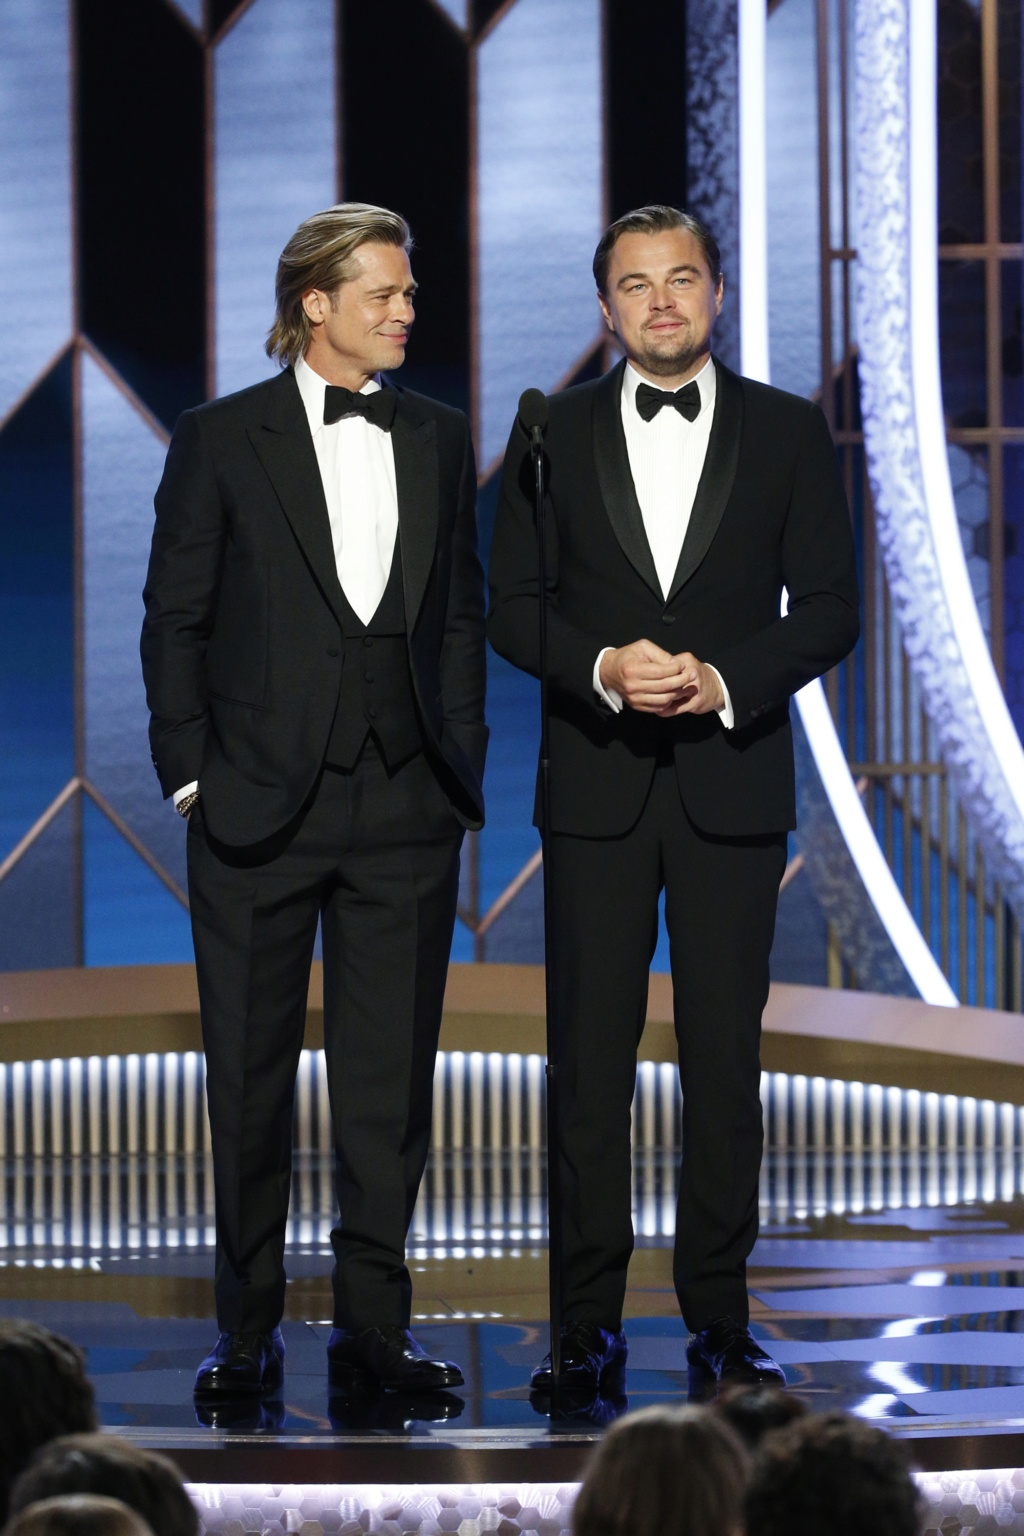 ¿Cuánto mide Brad Pitt? - Altura - Real height - Página 5 19616110